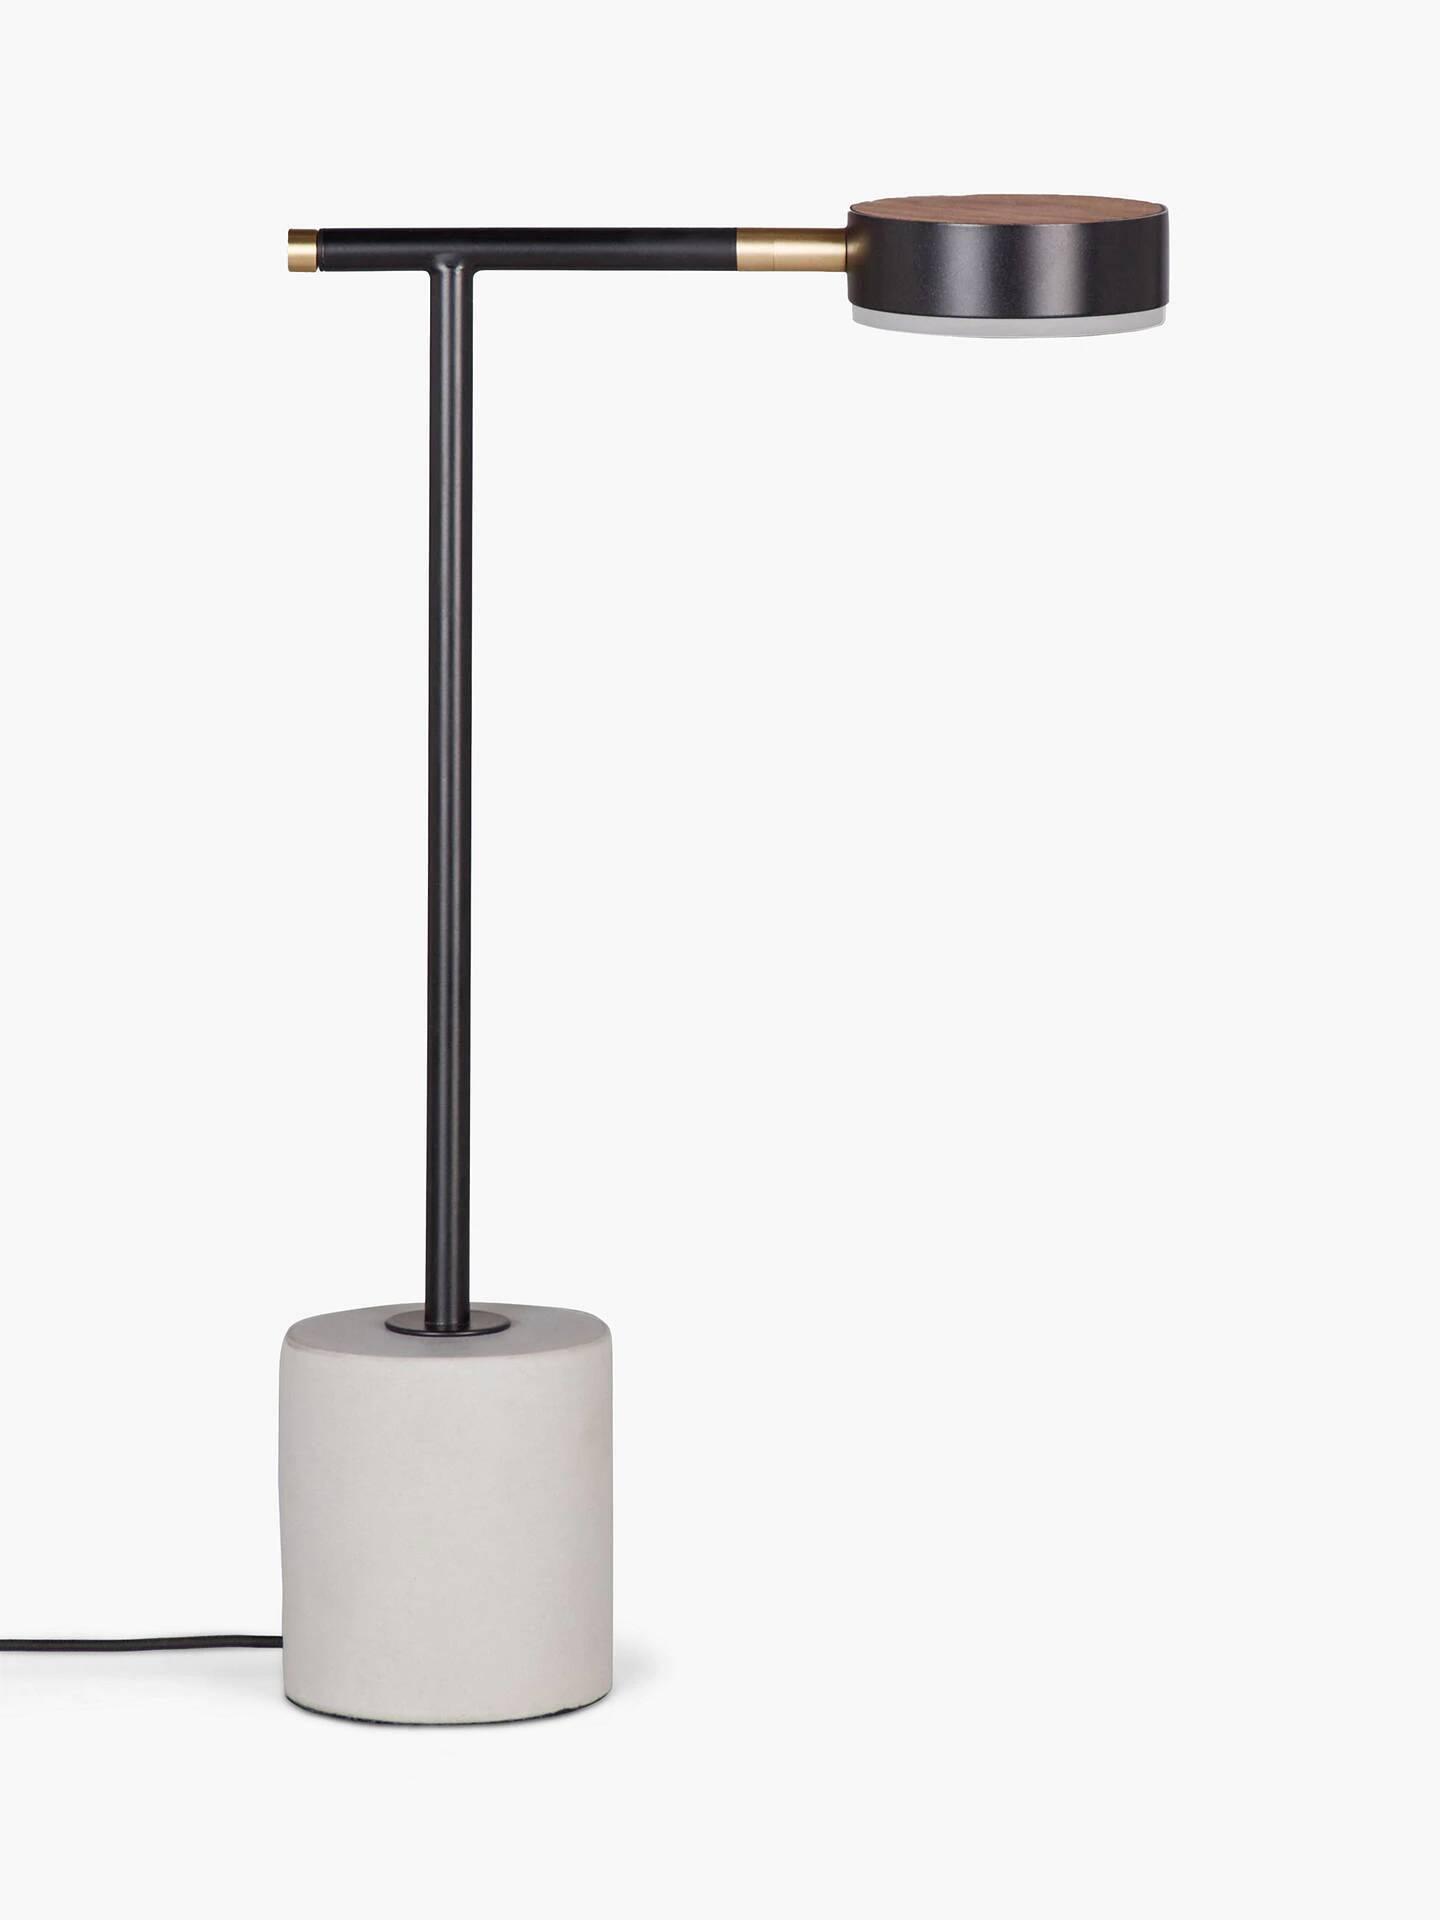 LED Color Changing Desk Lamps